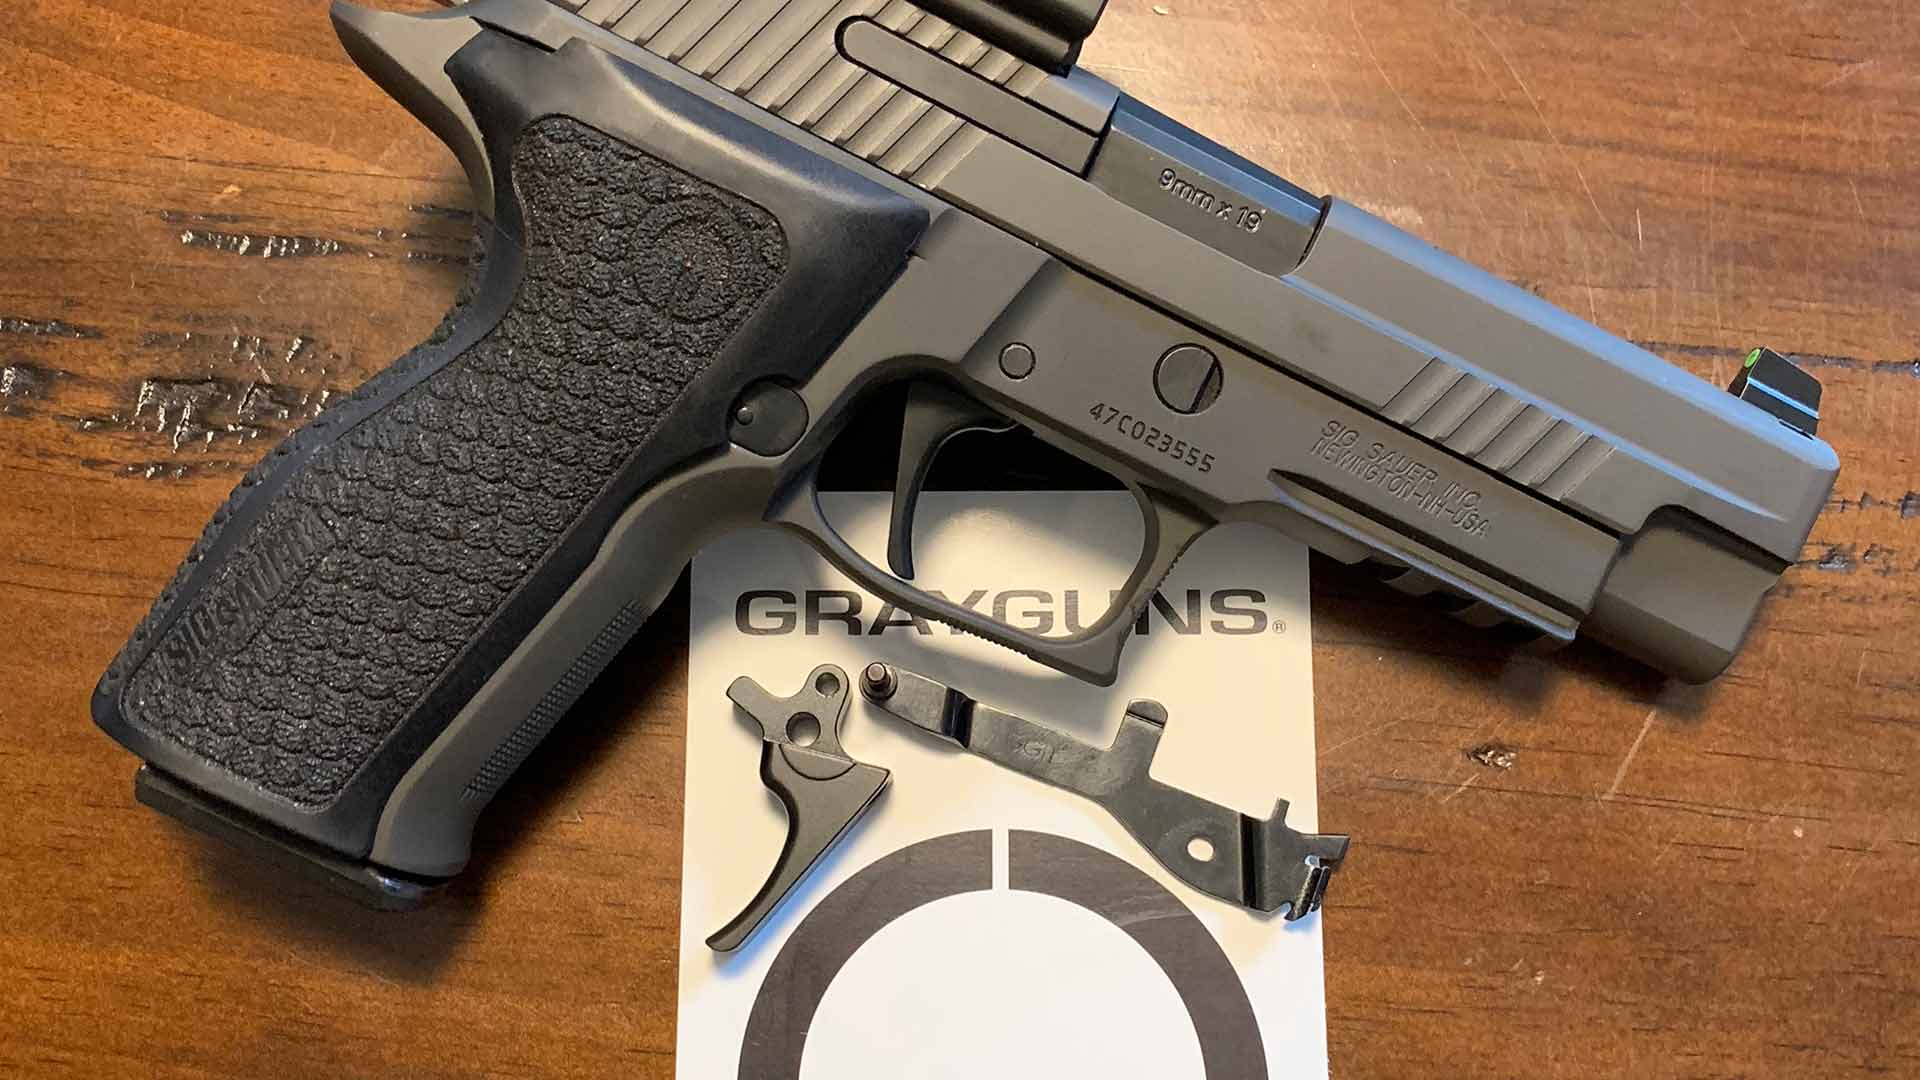 Grayguns EDC SOT trigger kit